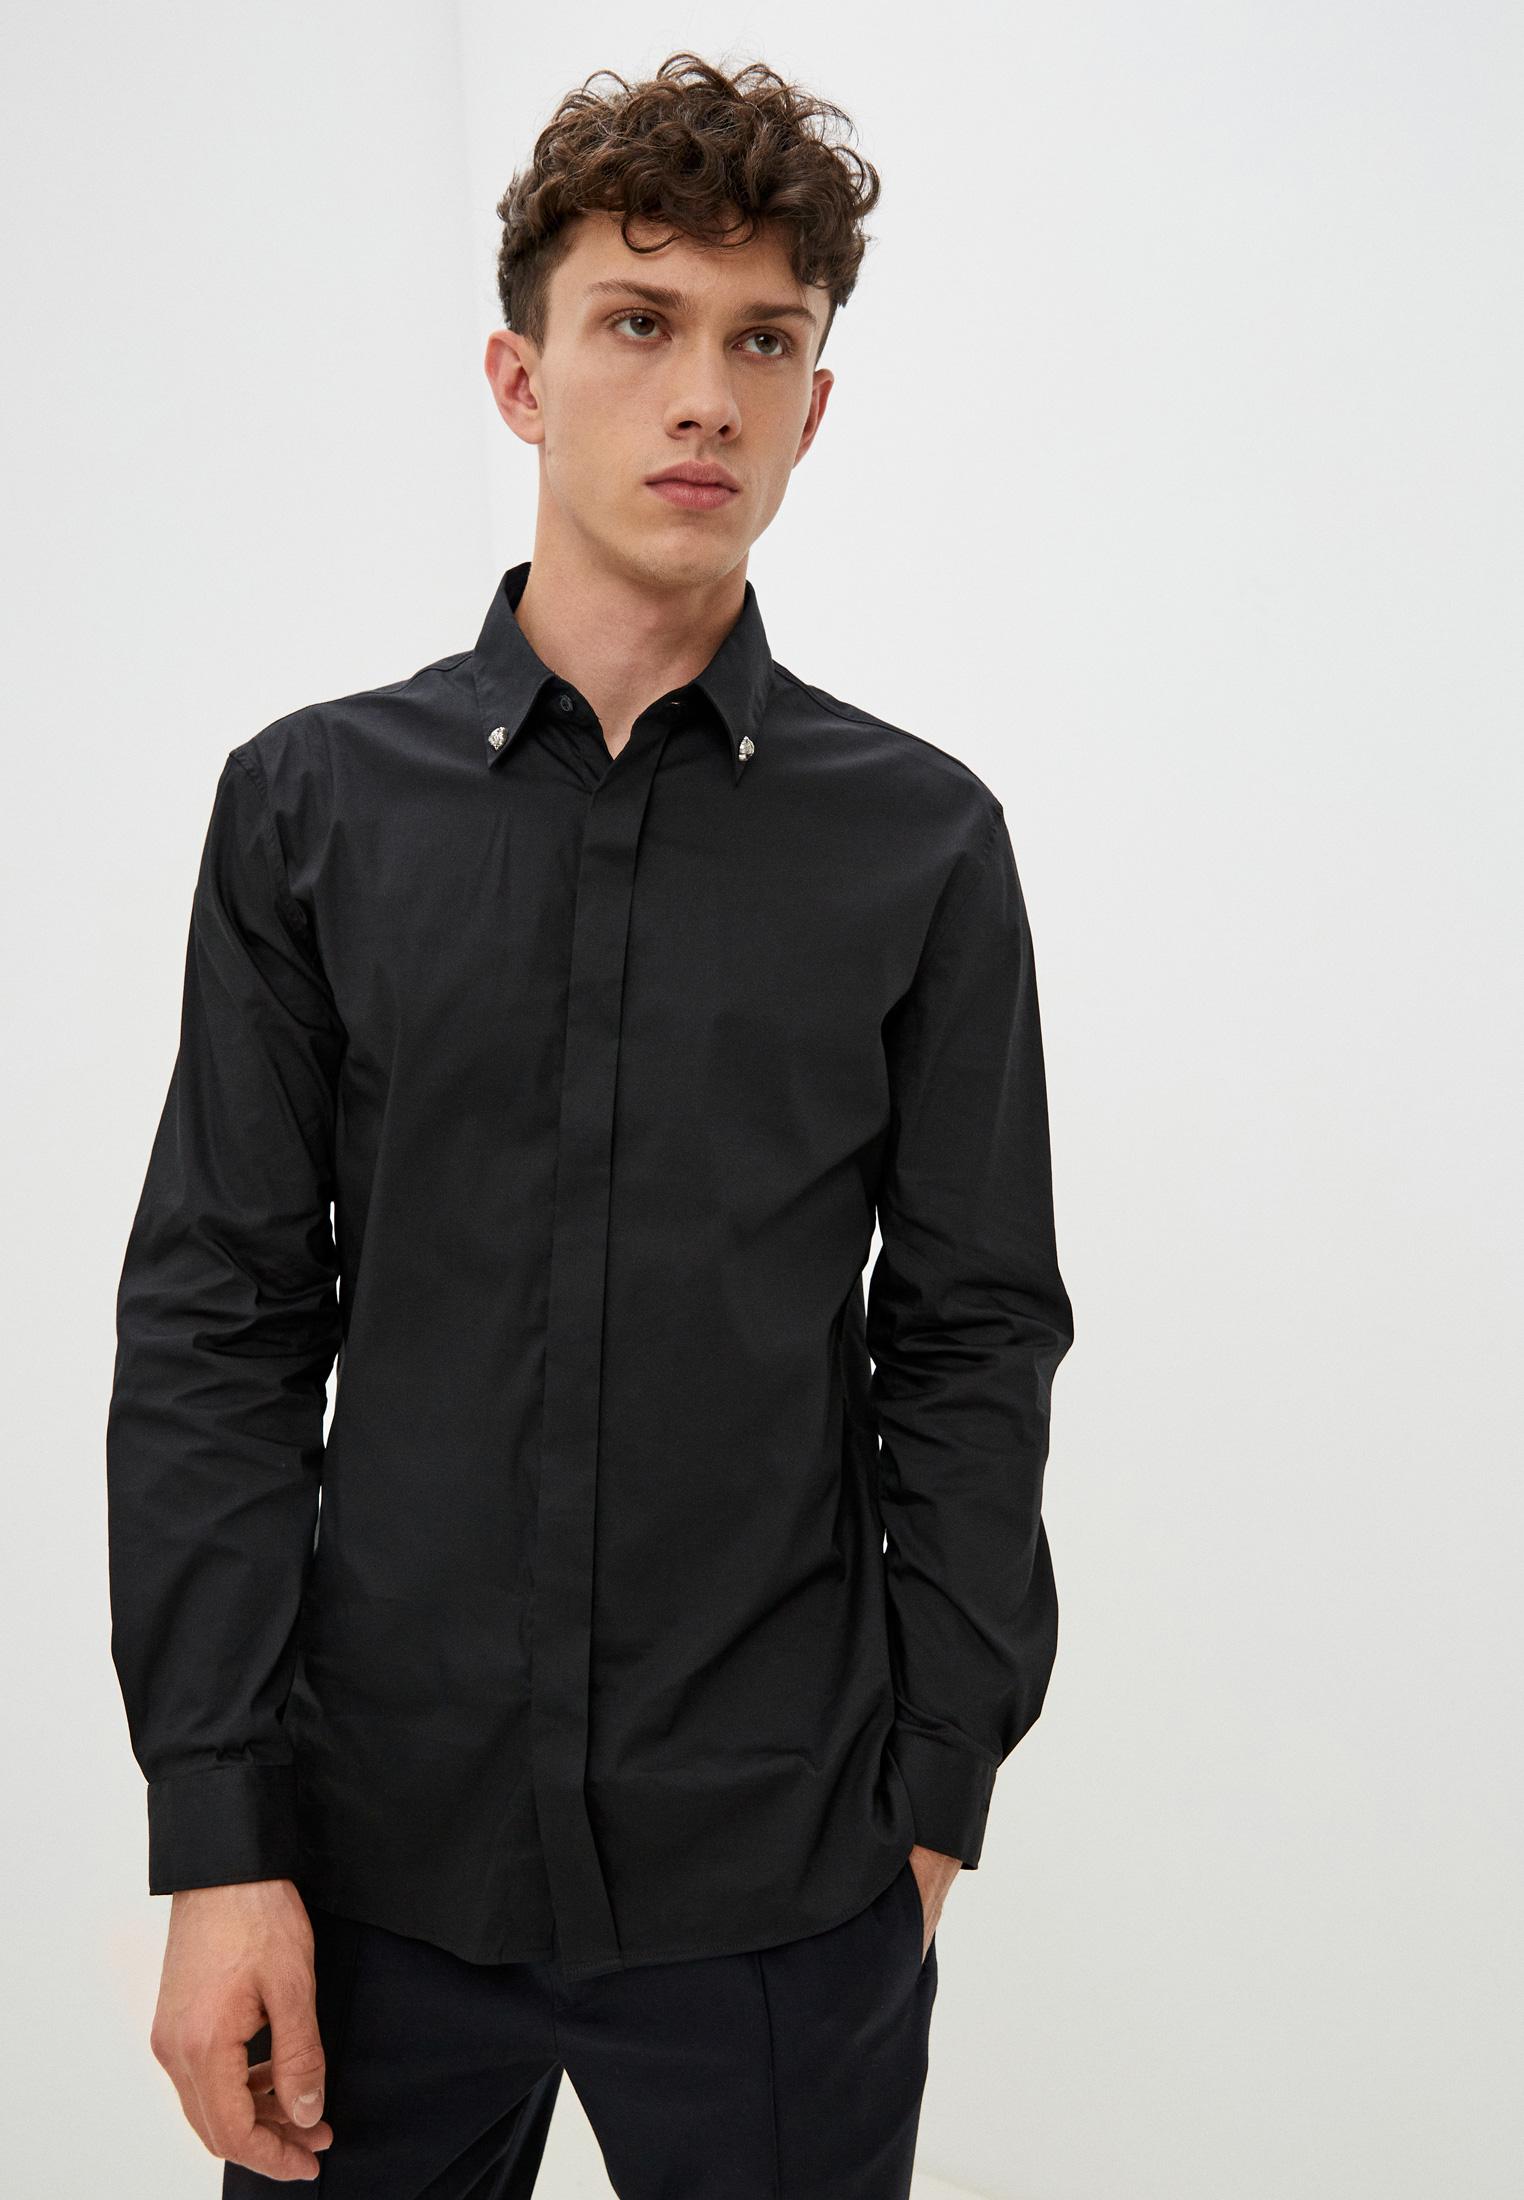 Рубашка с длинным рукавом Just Cavalli (Джаст Кавалли) S03DL0191 N38909